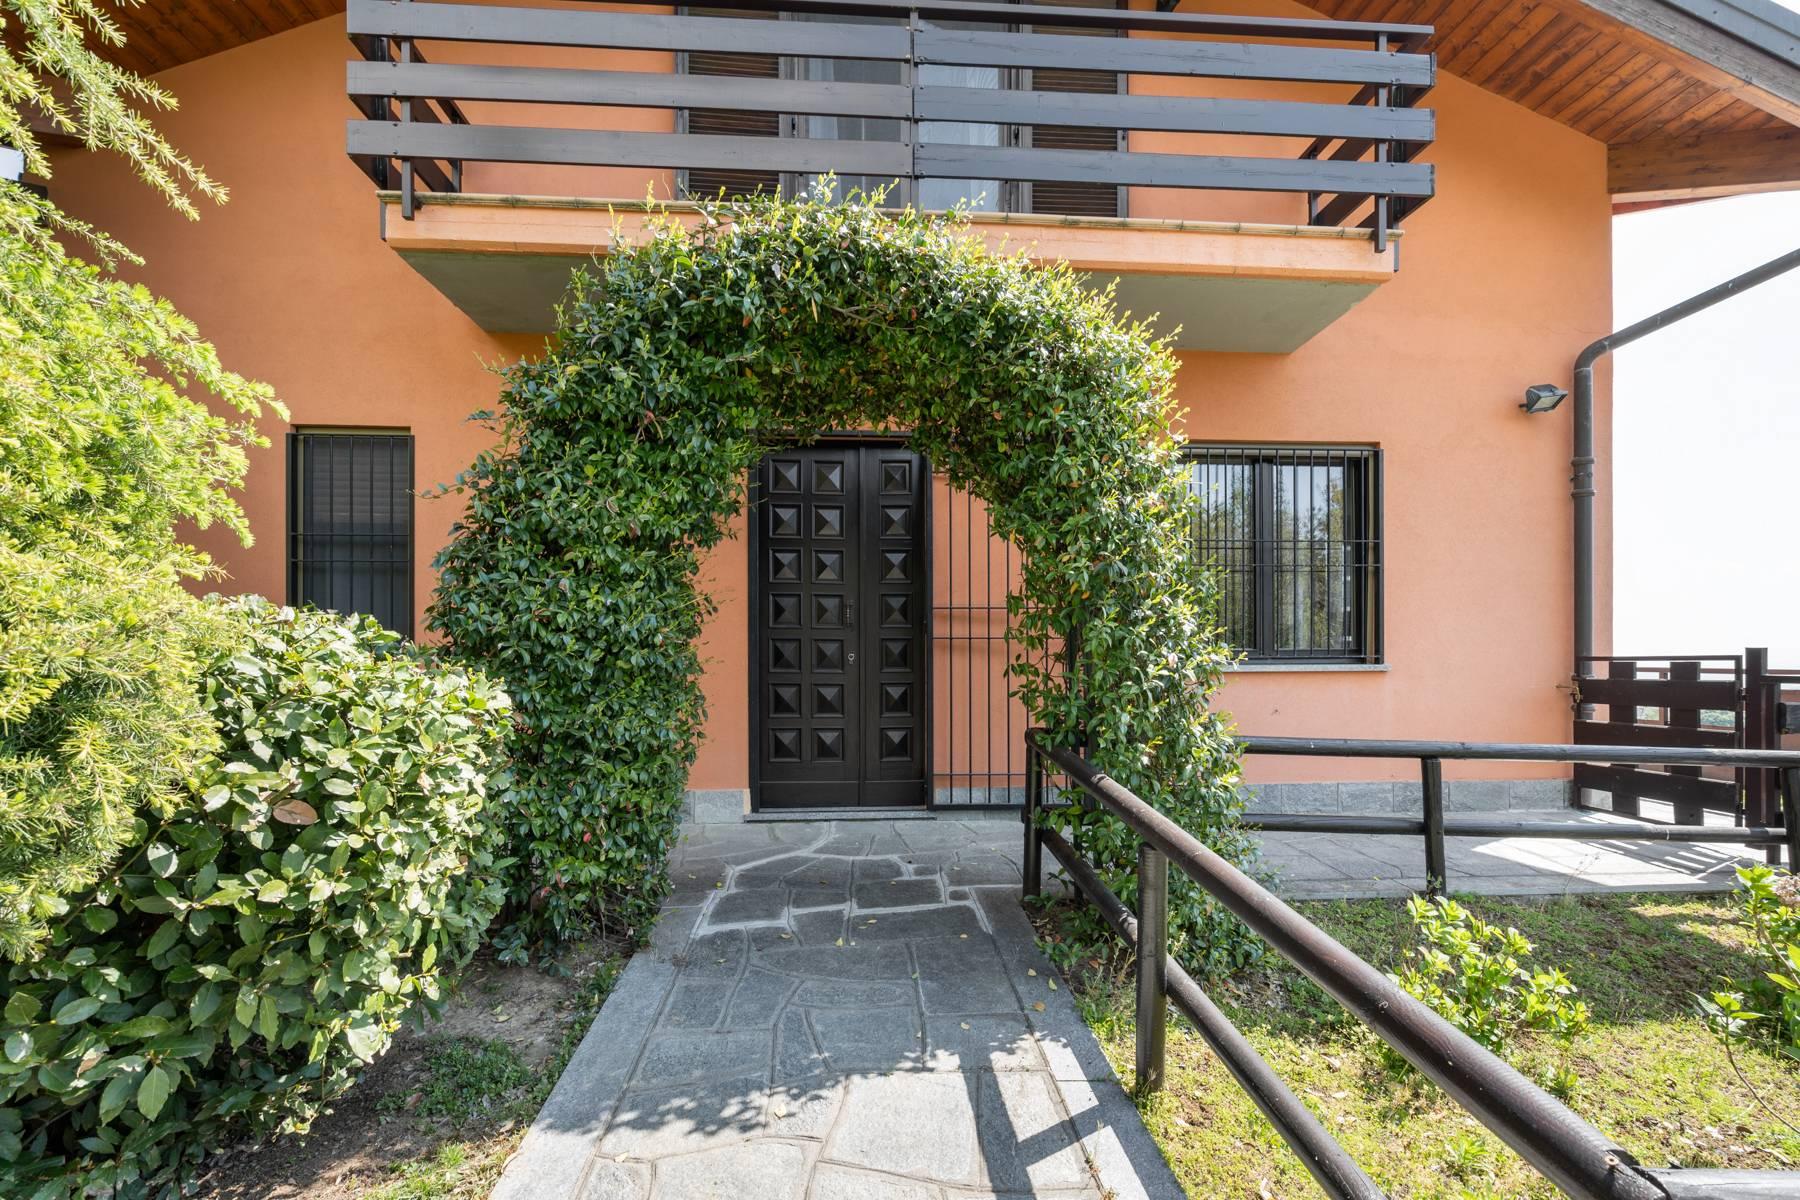 Villa in Vendita a Baldissero Torinese: 5 locali, 503 mq - Foto 16